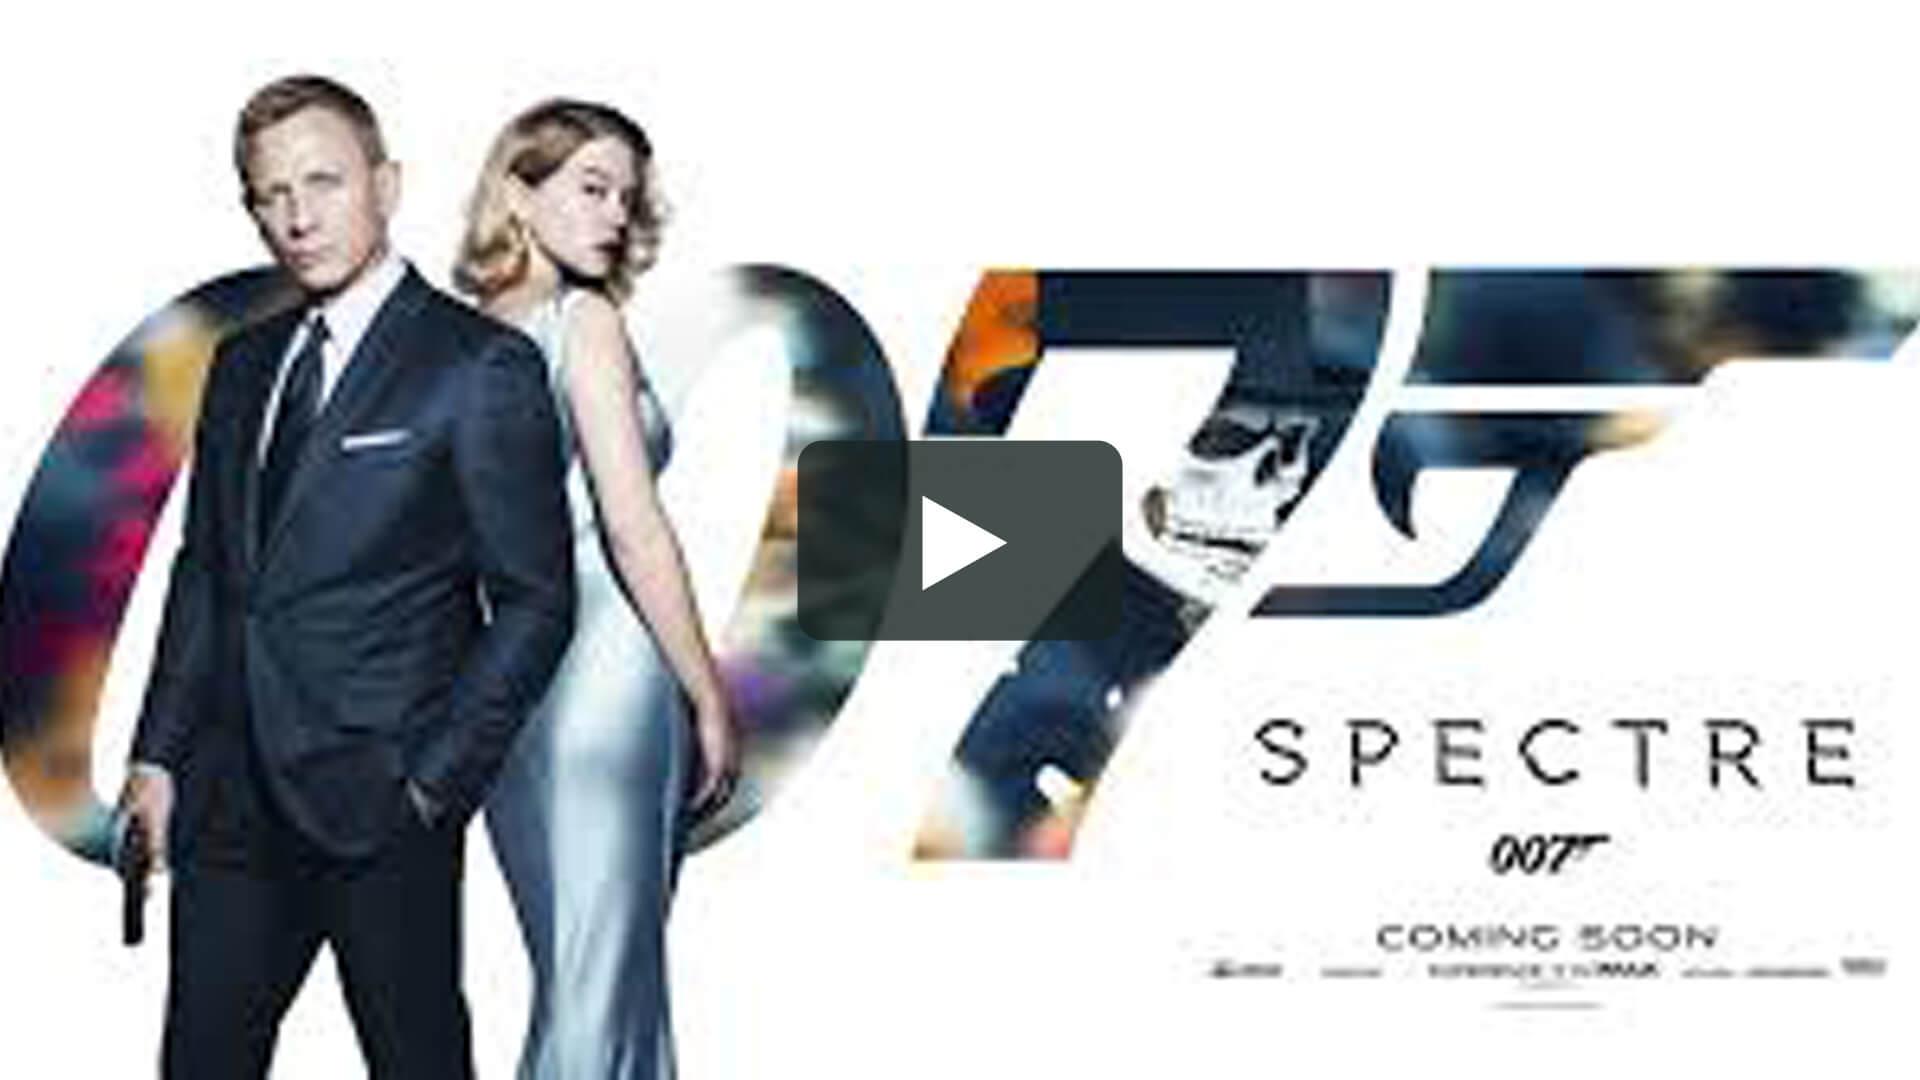 Spectre - 007:幽靈黨